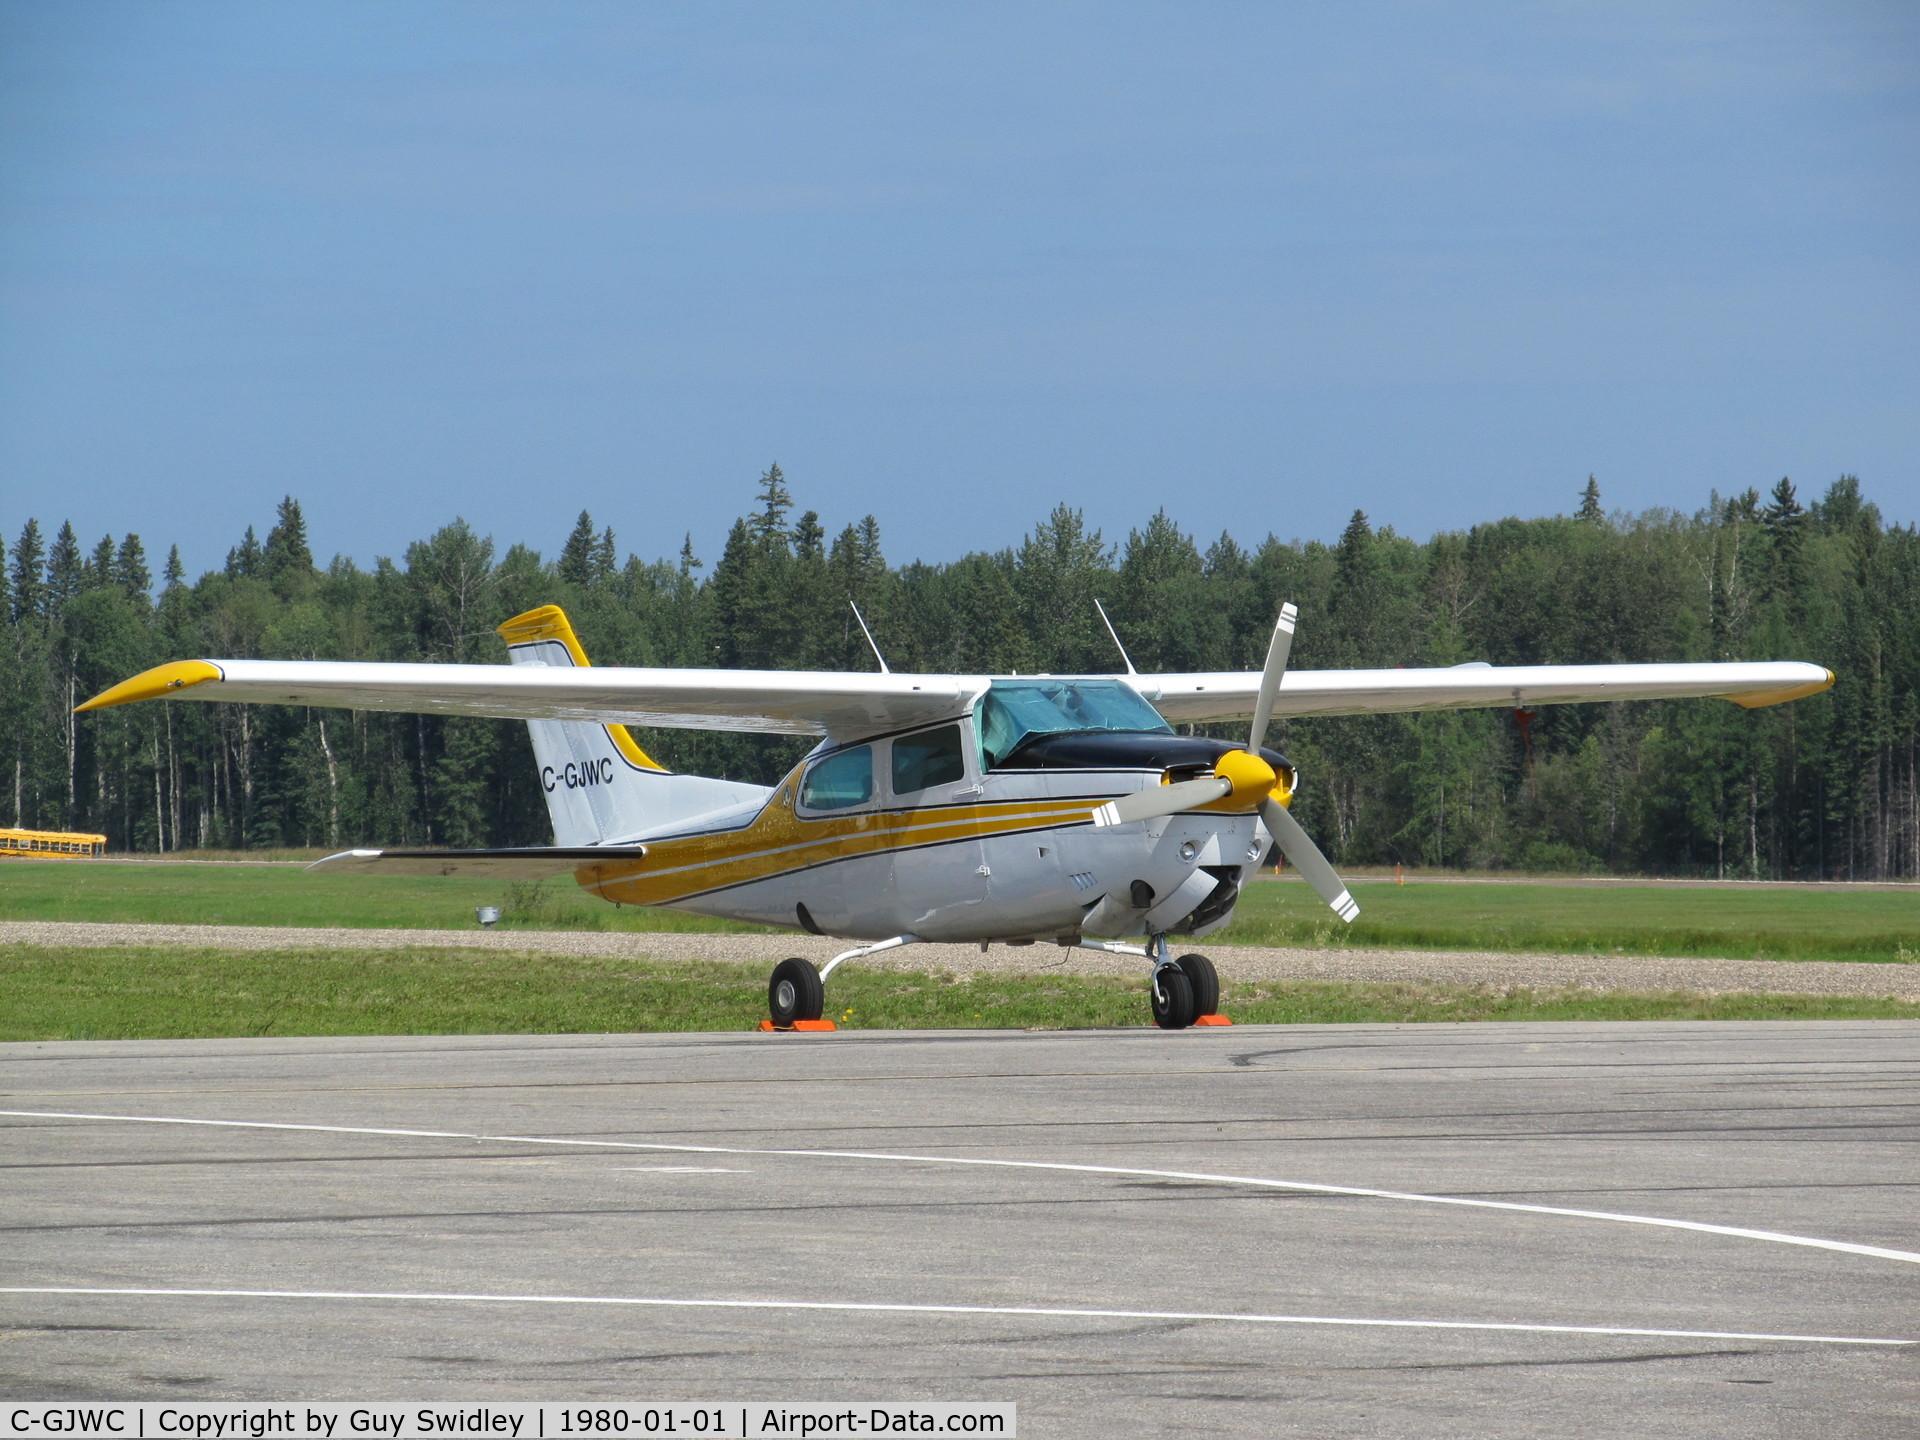 C-GJWC, 1974 Cessna T210L Turbo Centurion C/N 21060438, Cessna T210L visiting the 2012 Hometown Heroes Airshow, Whitecourt, Alberta.